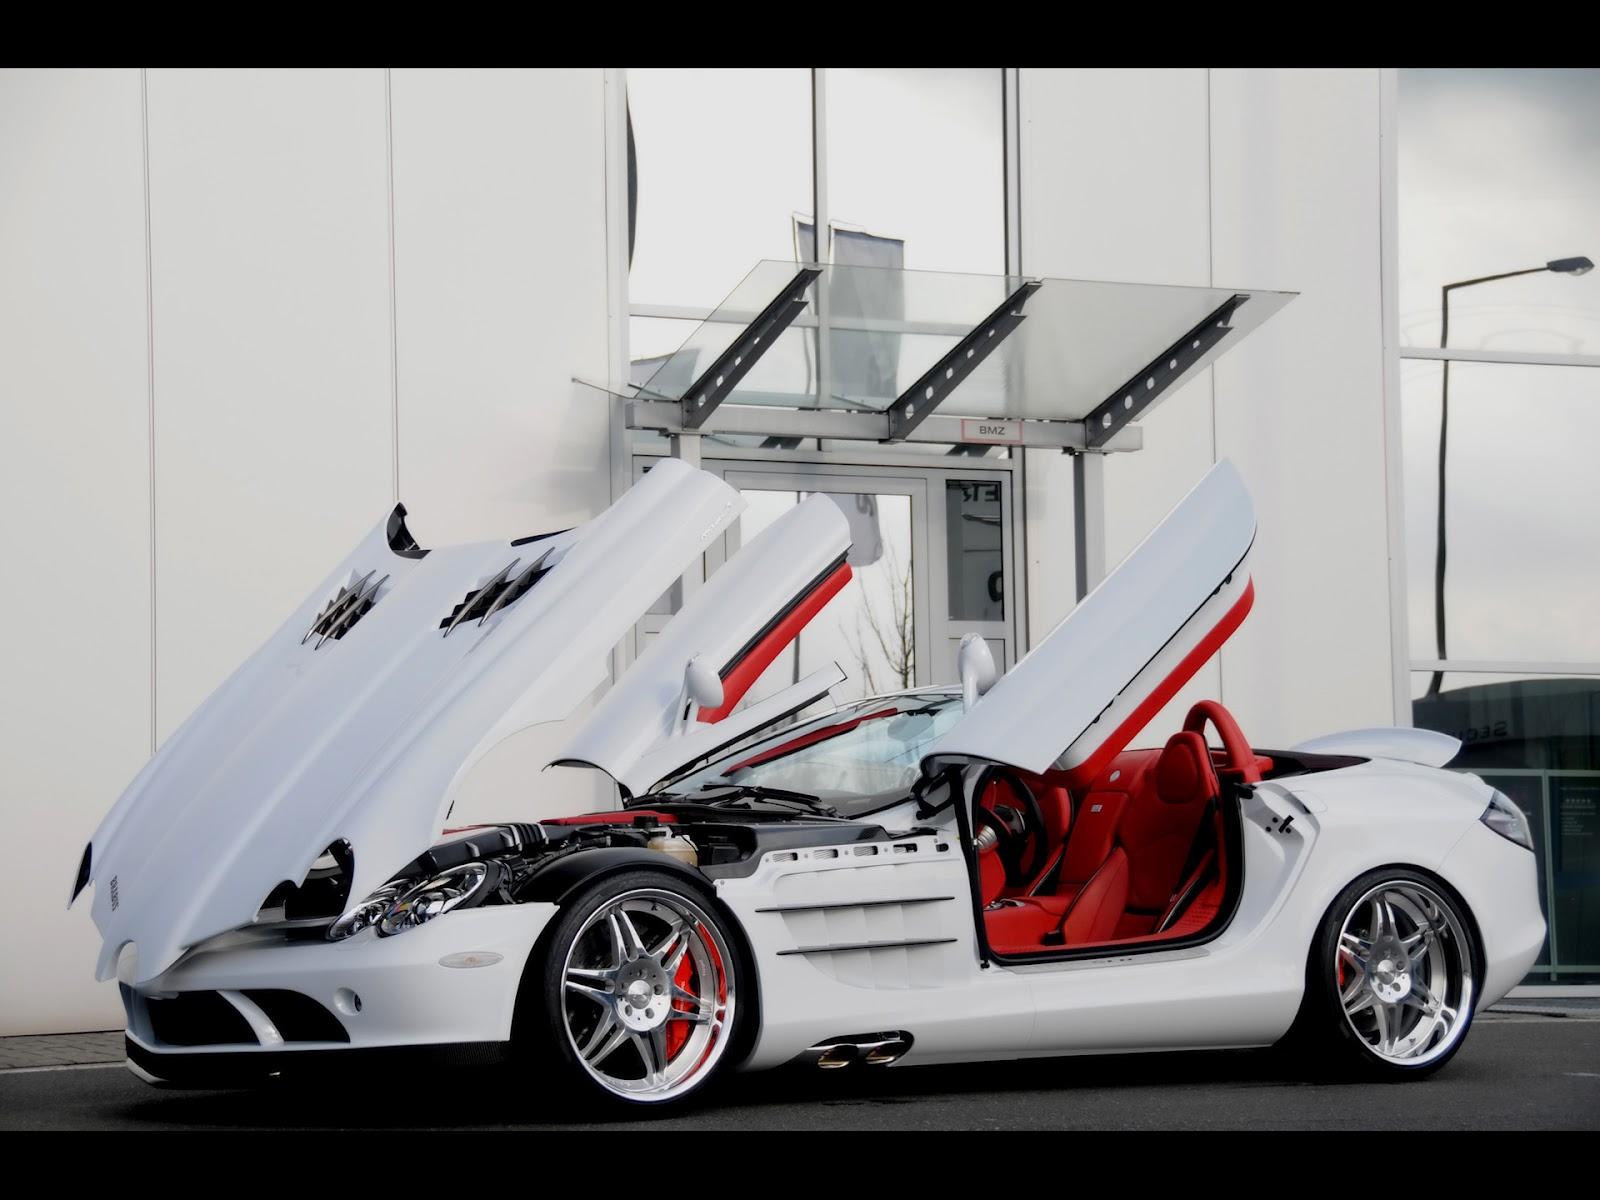 http://4.bp.blogspot.com/-uxxn63iT2lo/UCan9YM-4jI/AAAAAAAAAYs/TR85Y0d0JEg/s1600/Mercedes-Benz_SLR_McLaren+(6).jpg